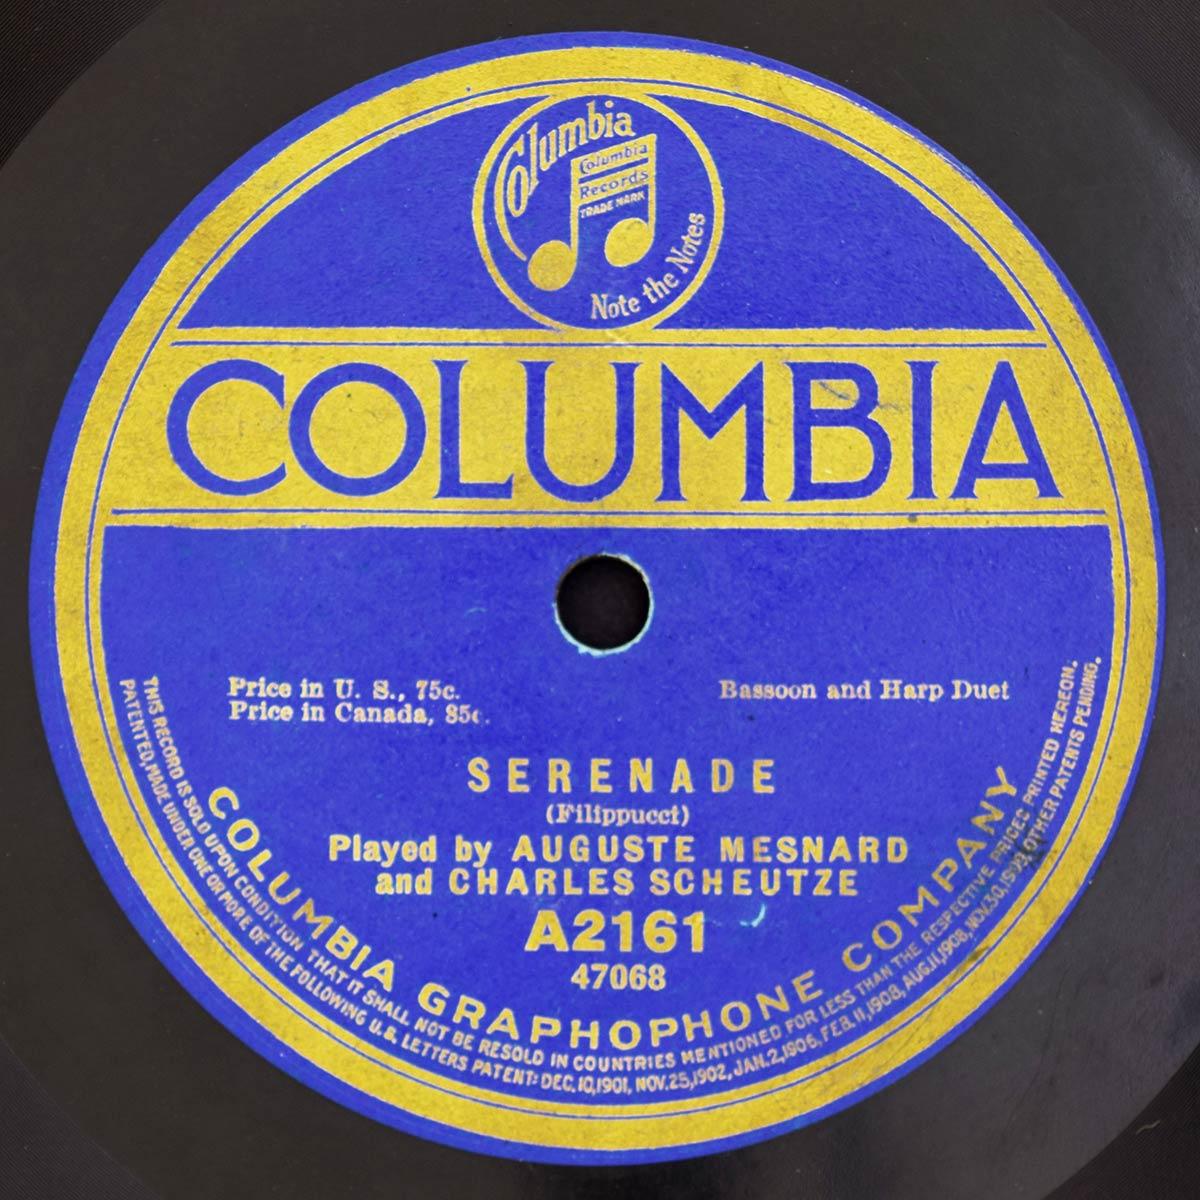 1916 Recording of Auguste Mesnard « David A  Wells, bassoon